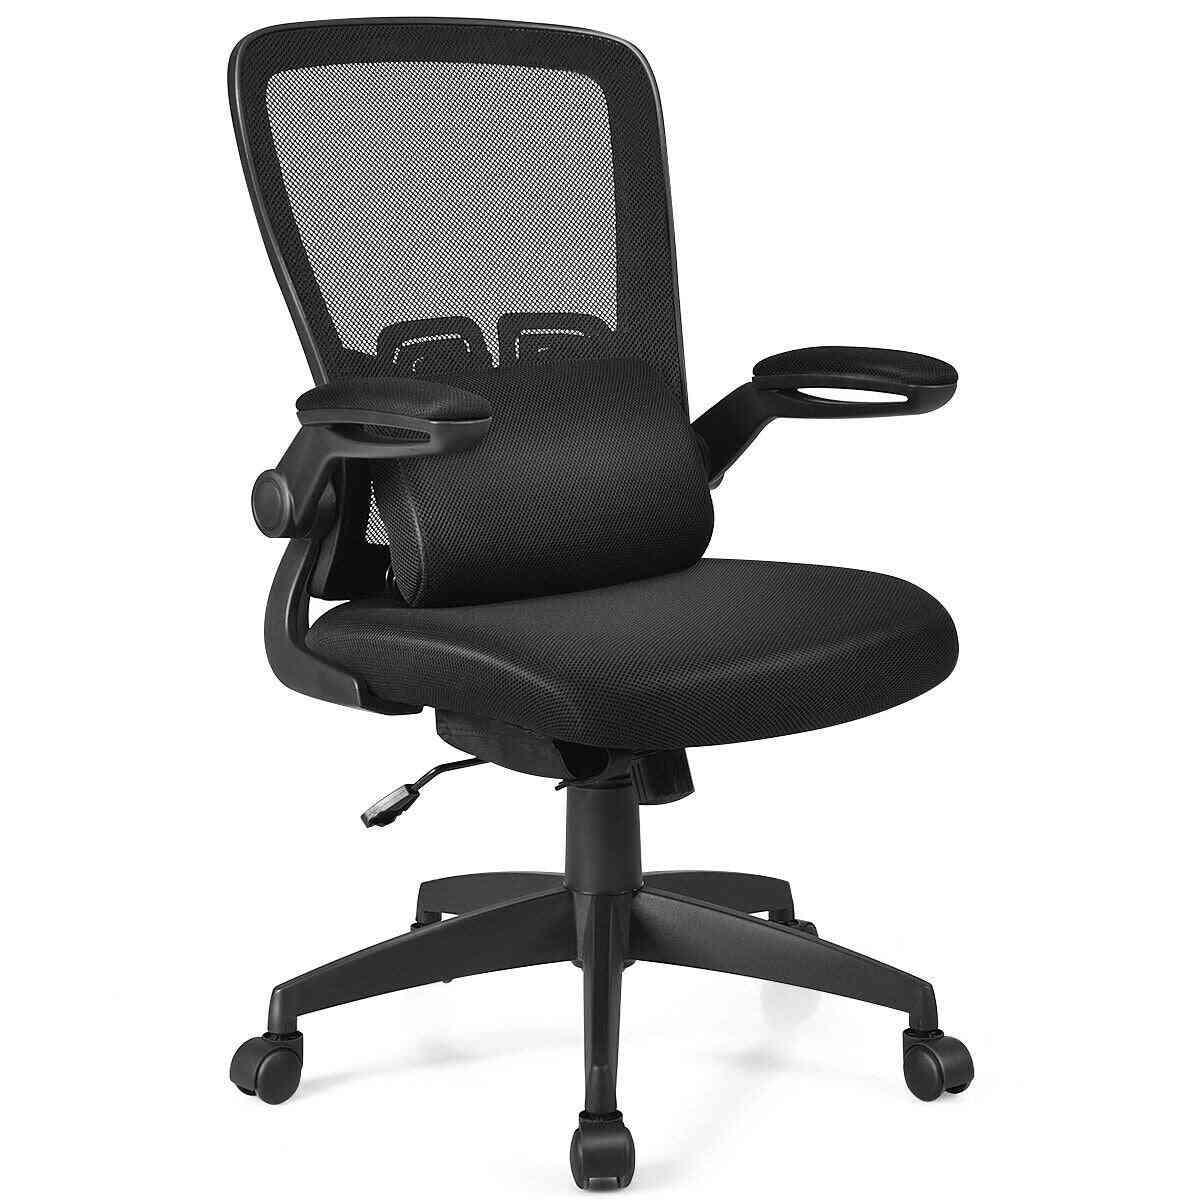 Desk Chair With Flip Up Armrest